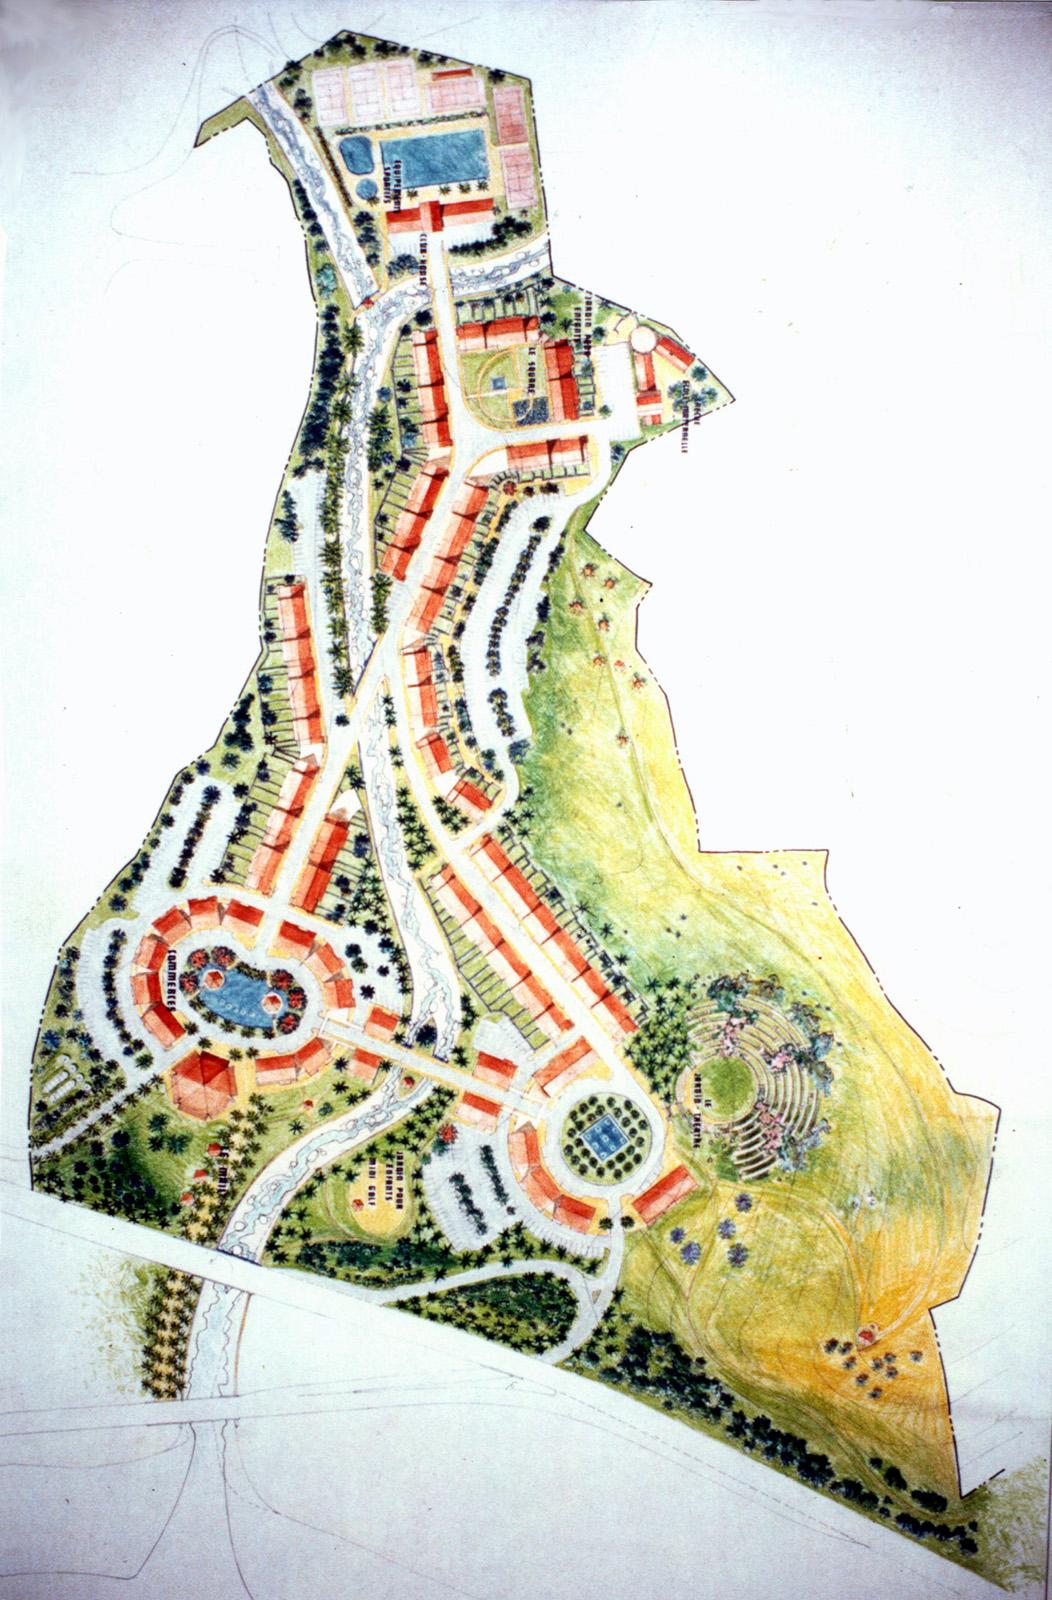 plan-de-masse-Boucan-Canot